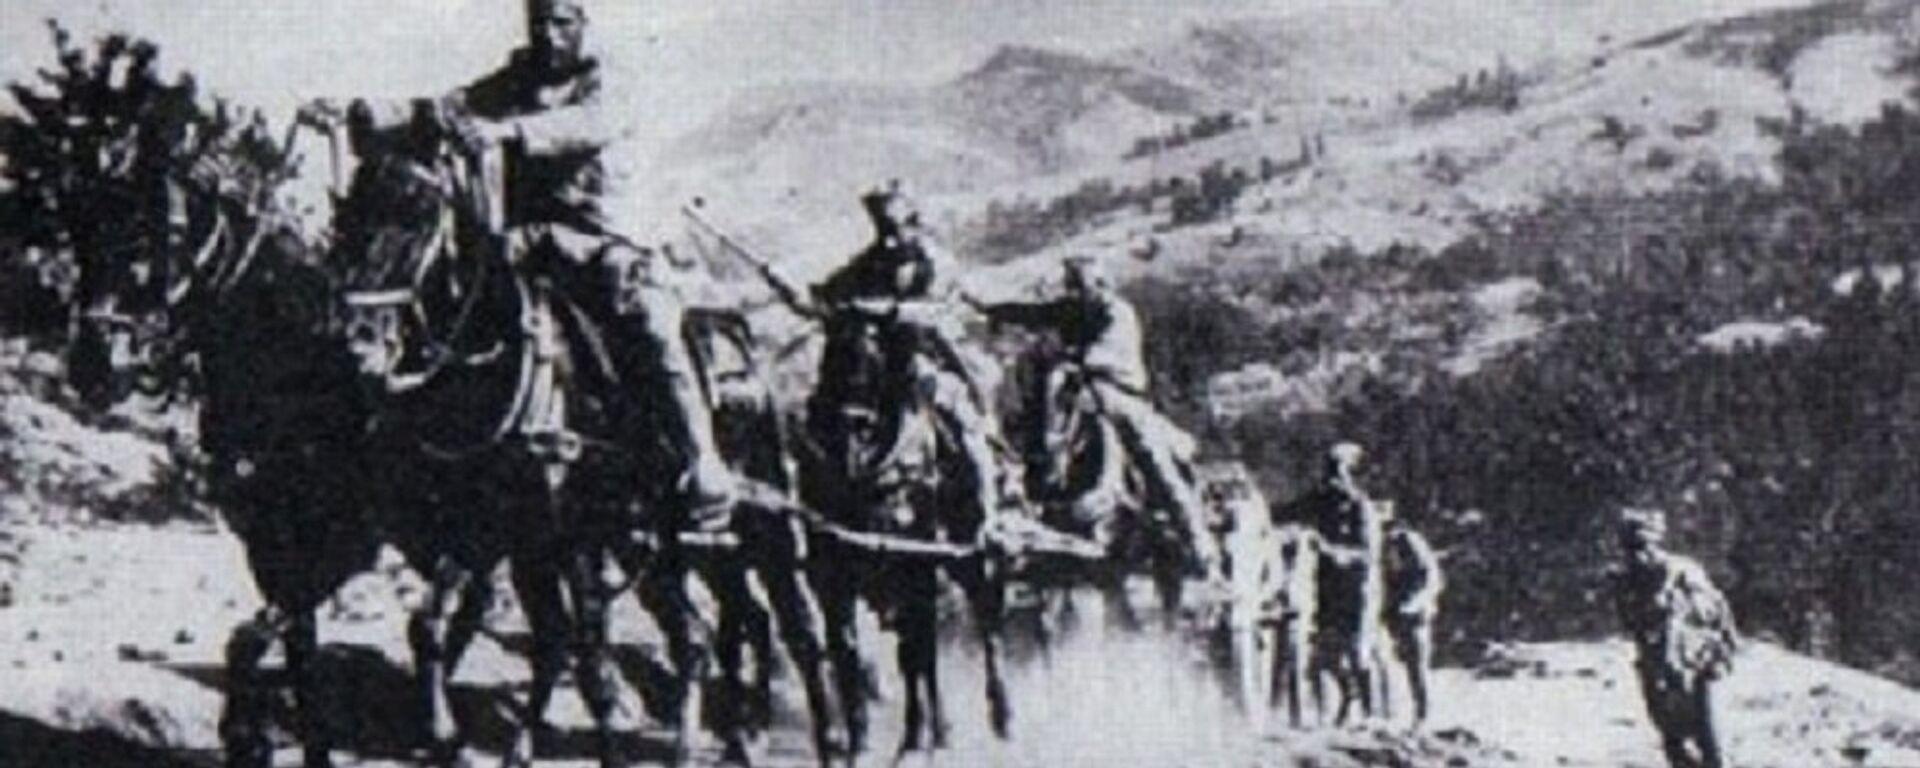 Солунски фронт - Sputnik Србија, 1920, 23.07.2020